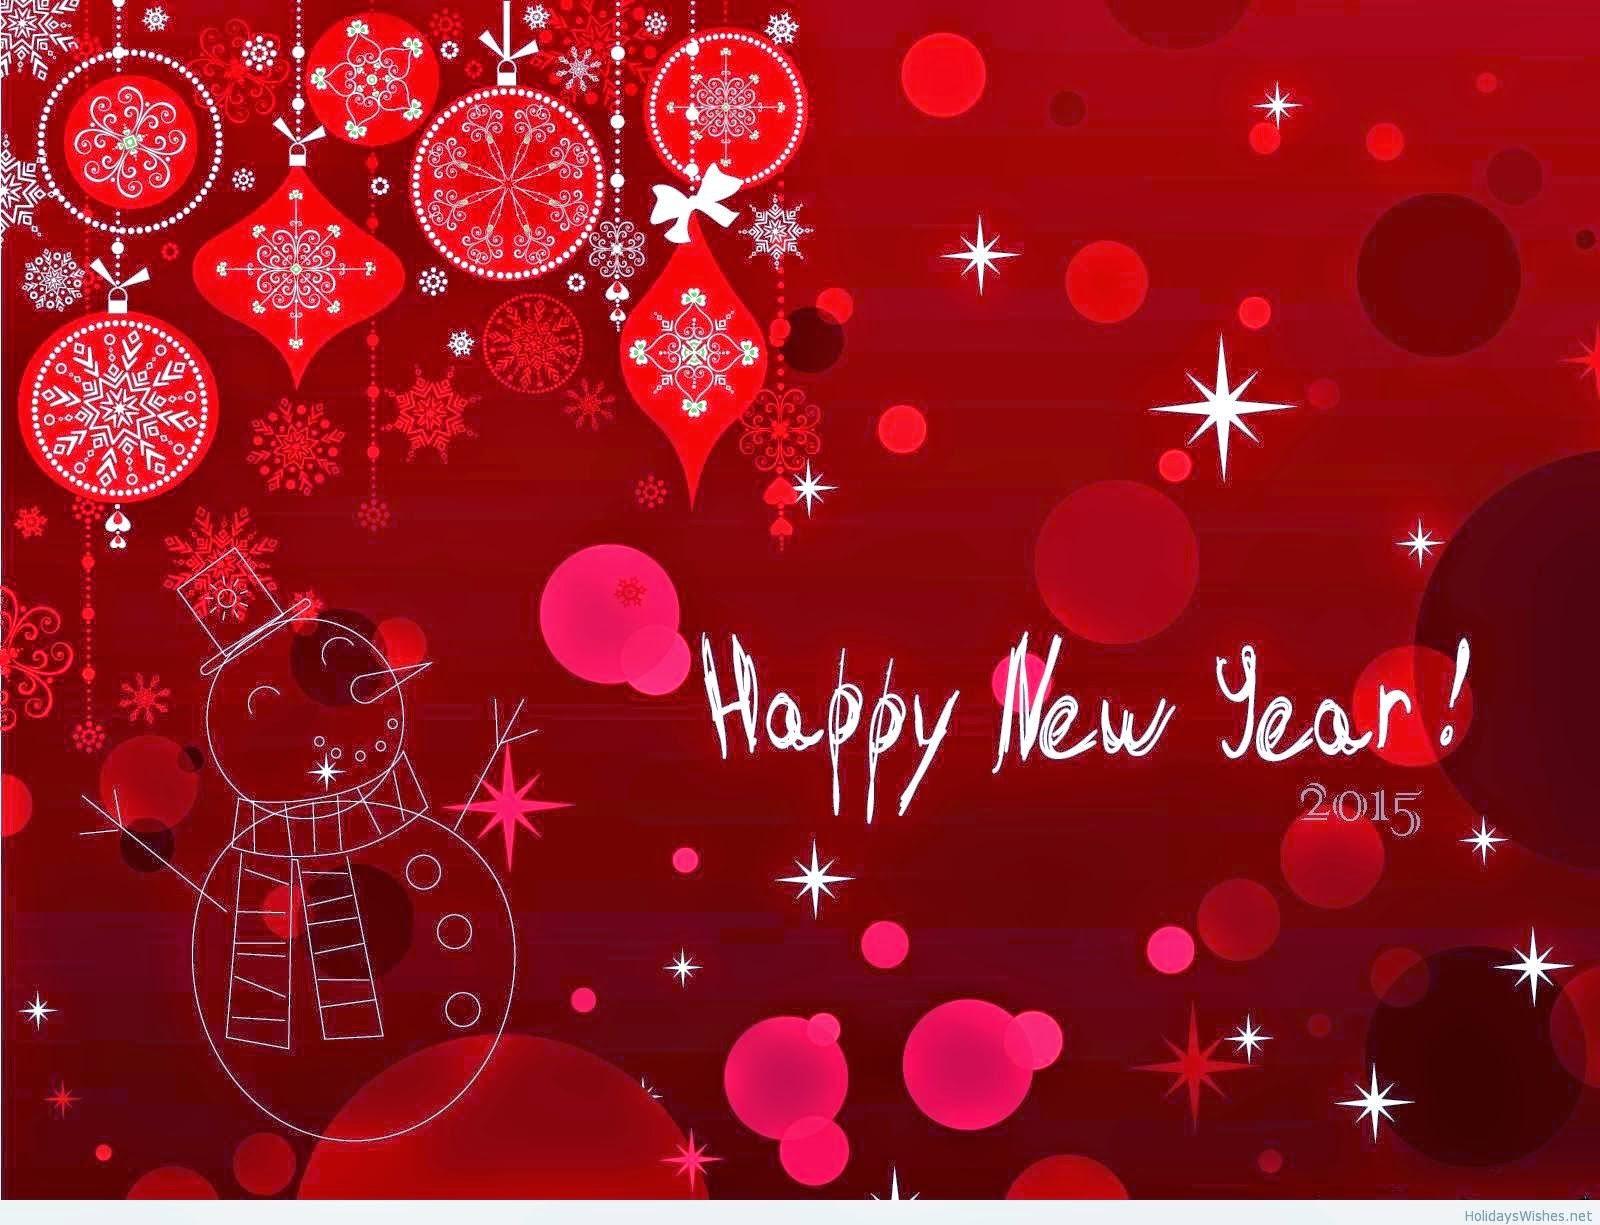 Happy New Year 2021 wallpaper for boyfriend and girlfriend